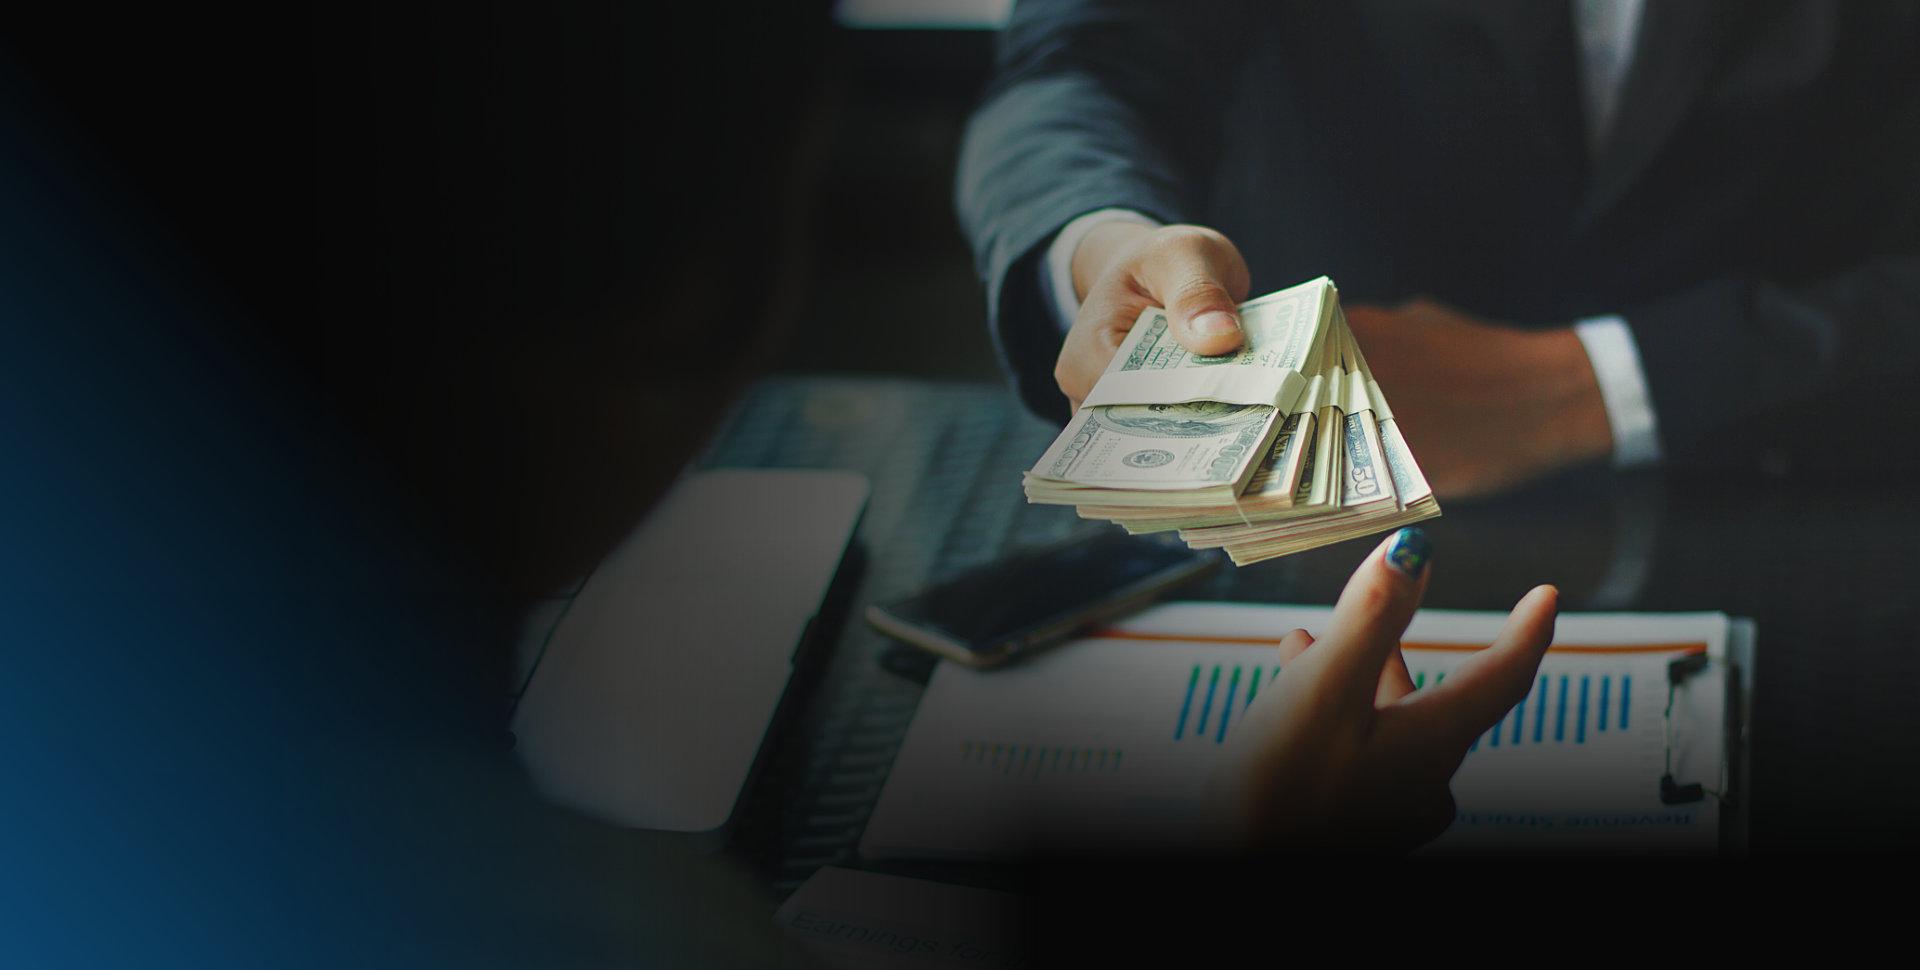 two people handing cash